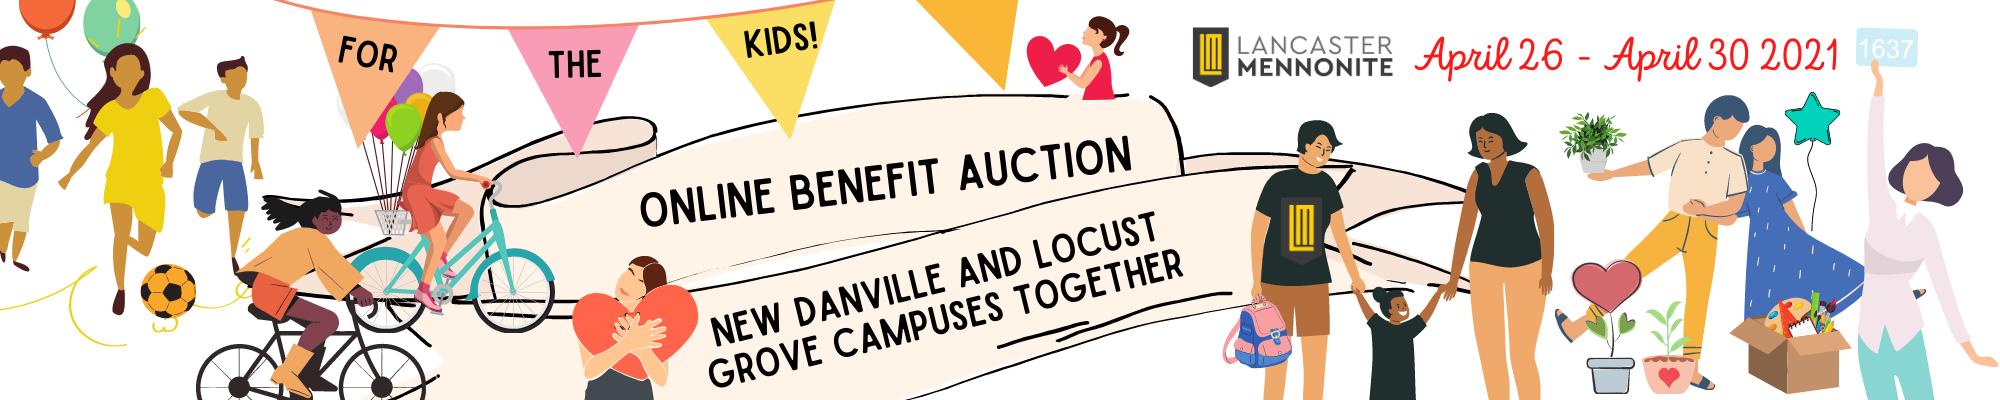 auction event banner 2021